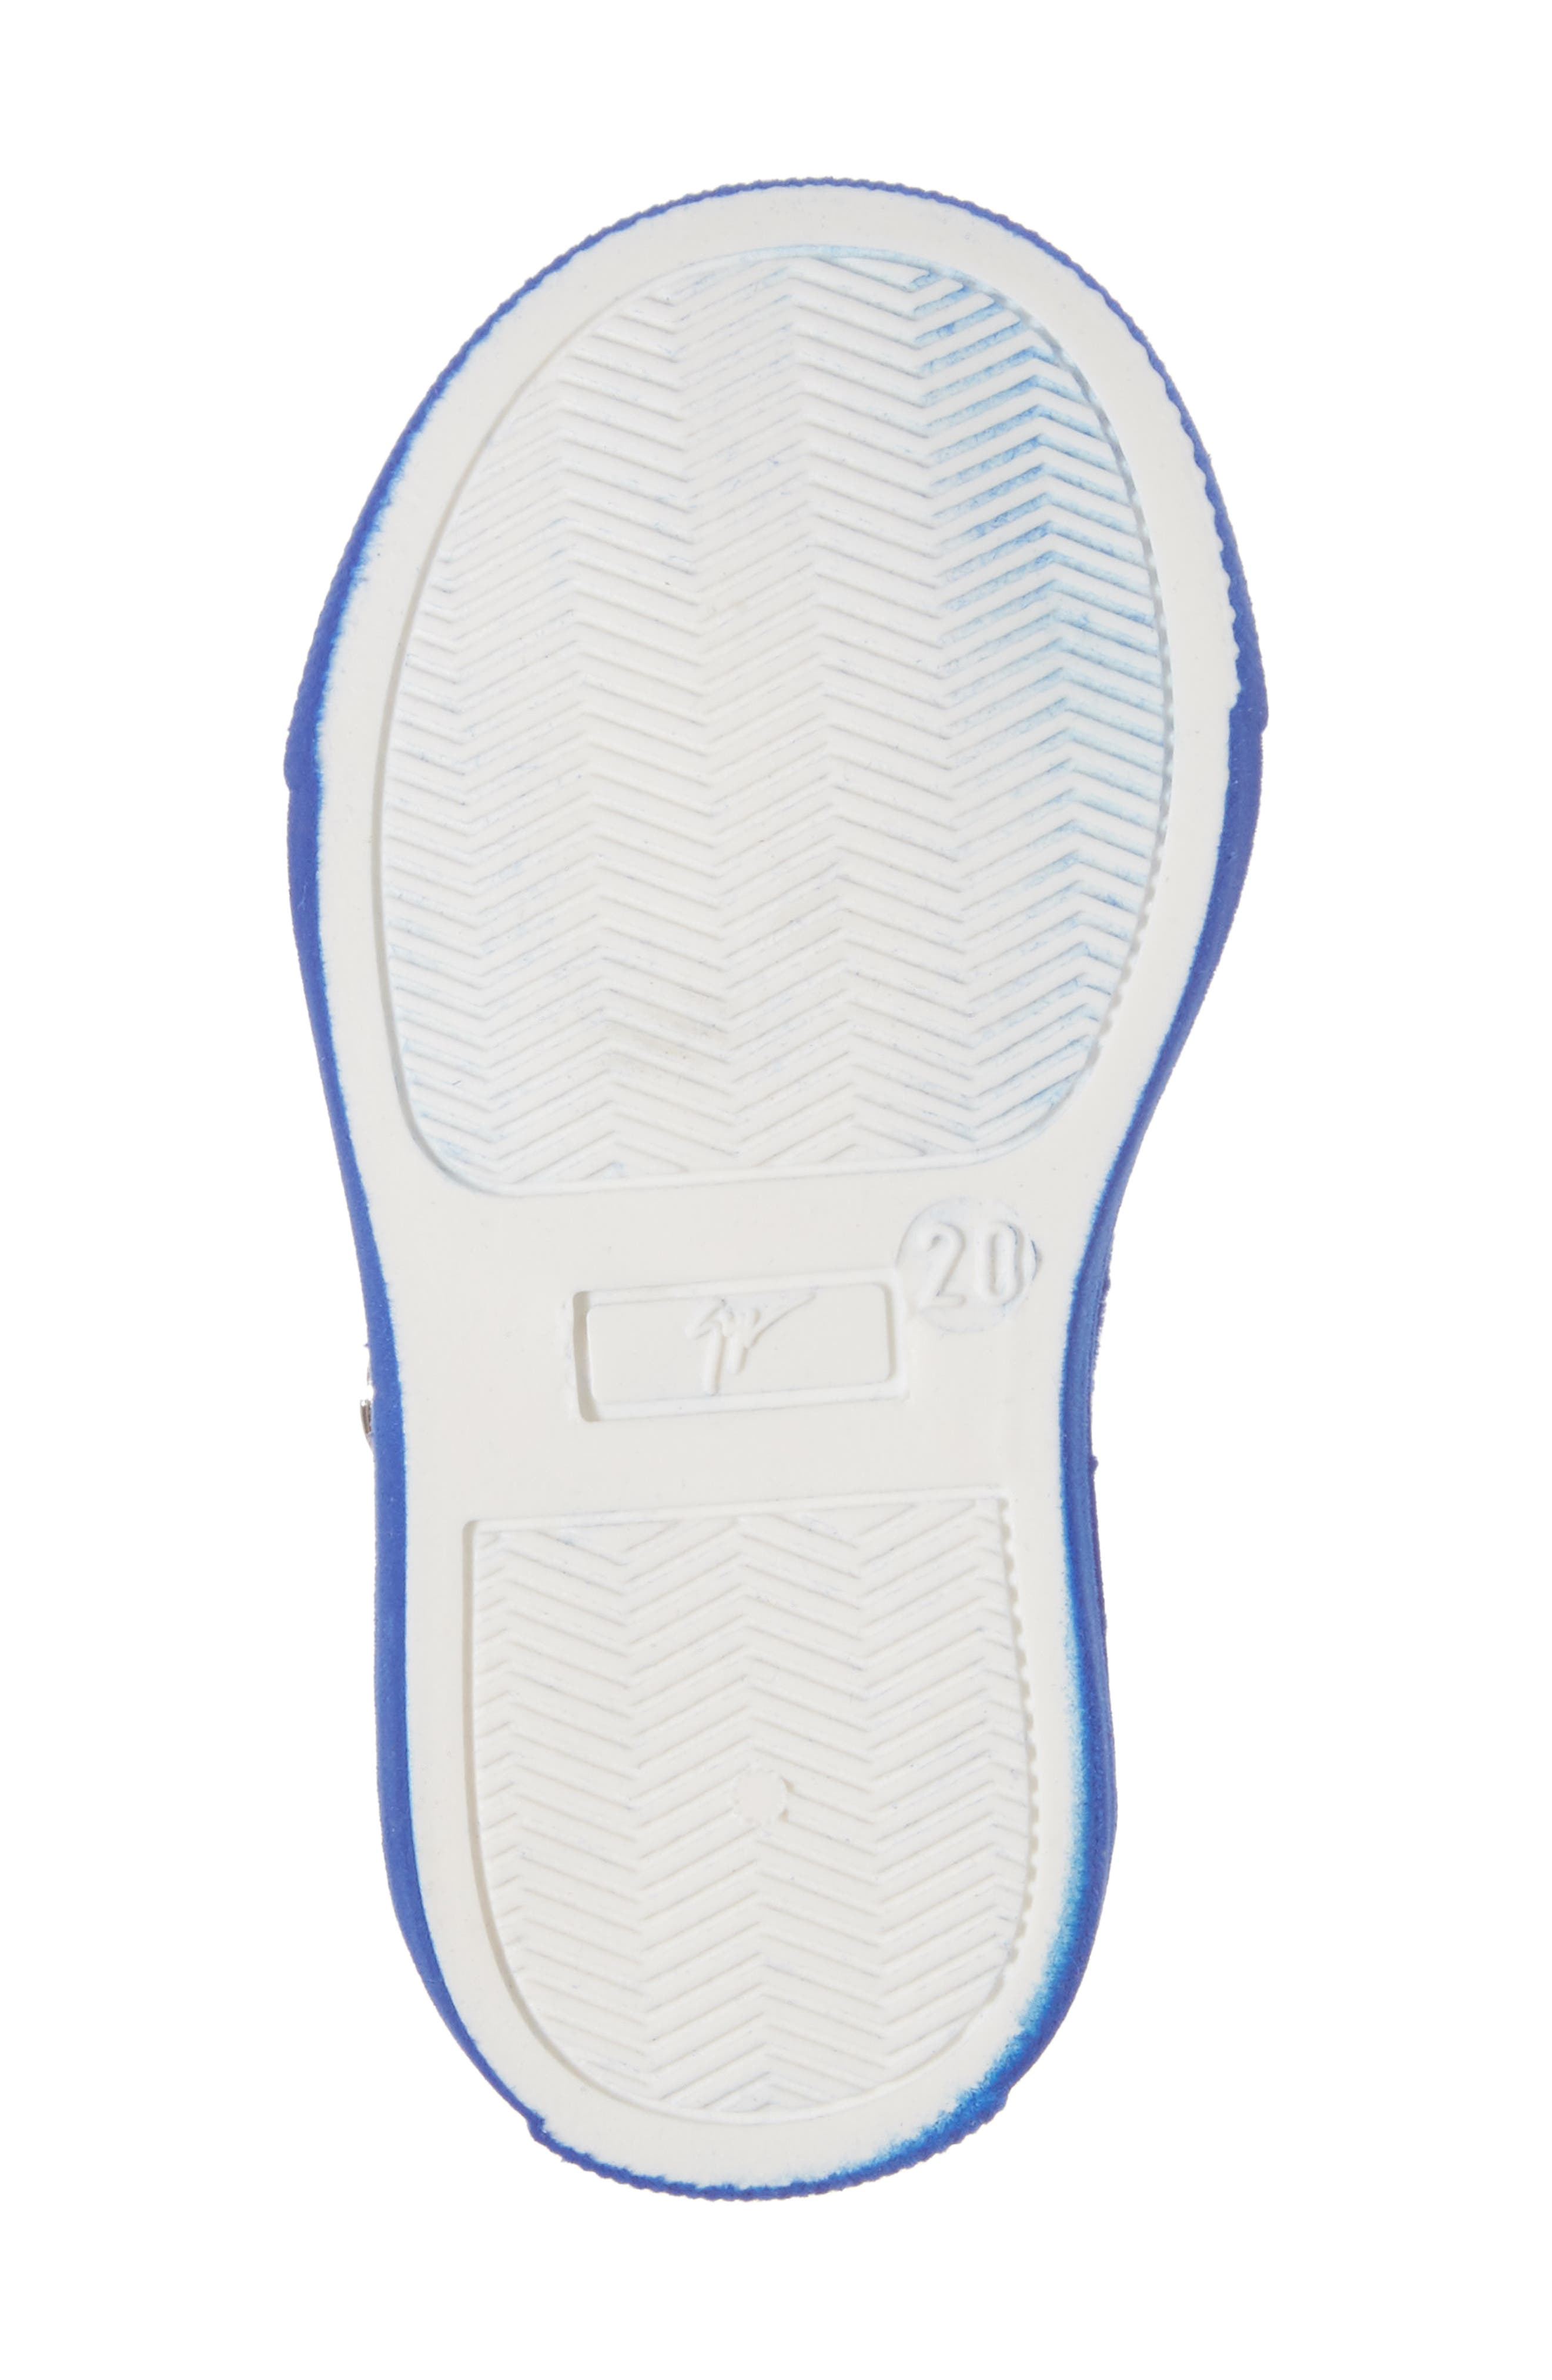 Smuggy Sneaker,                             Alternate thumbnail 6, color,                             400